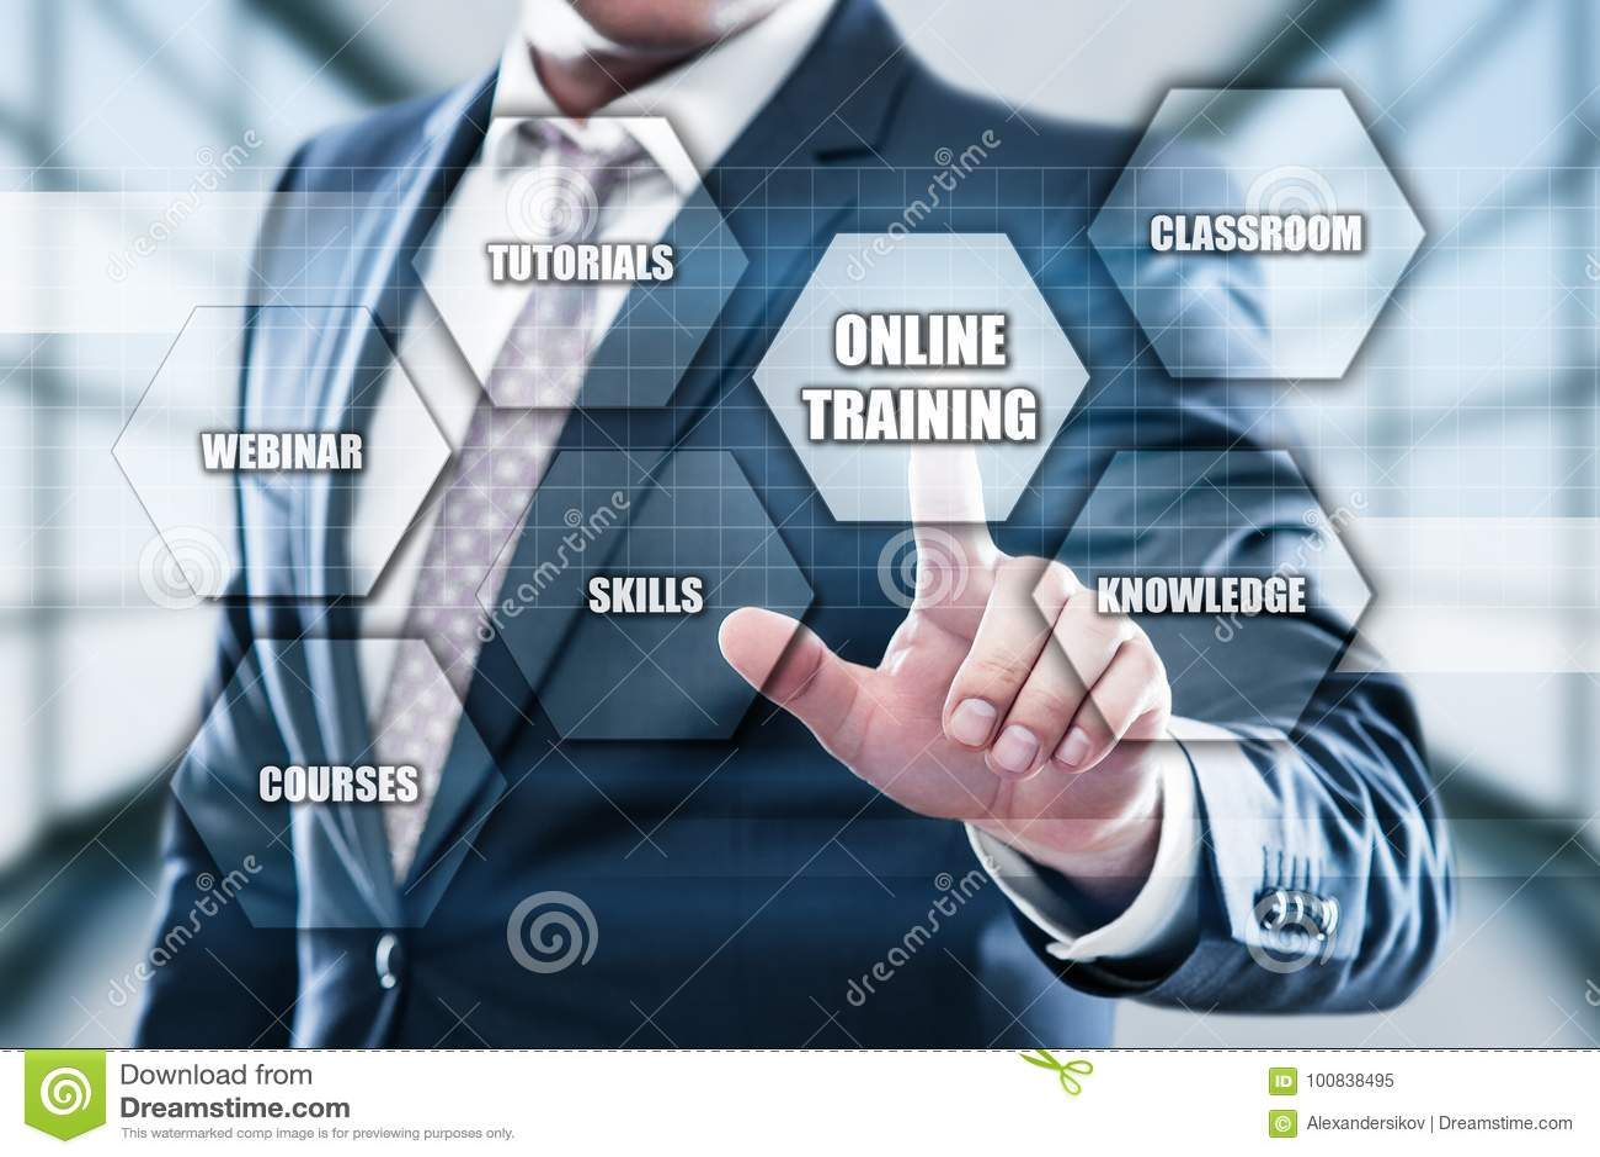 On-line-Training Webinar-E-Learning-Fähigkeits-Geschäfts-Internet-Technologie-Konzept